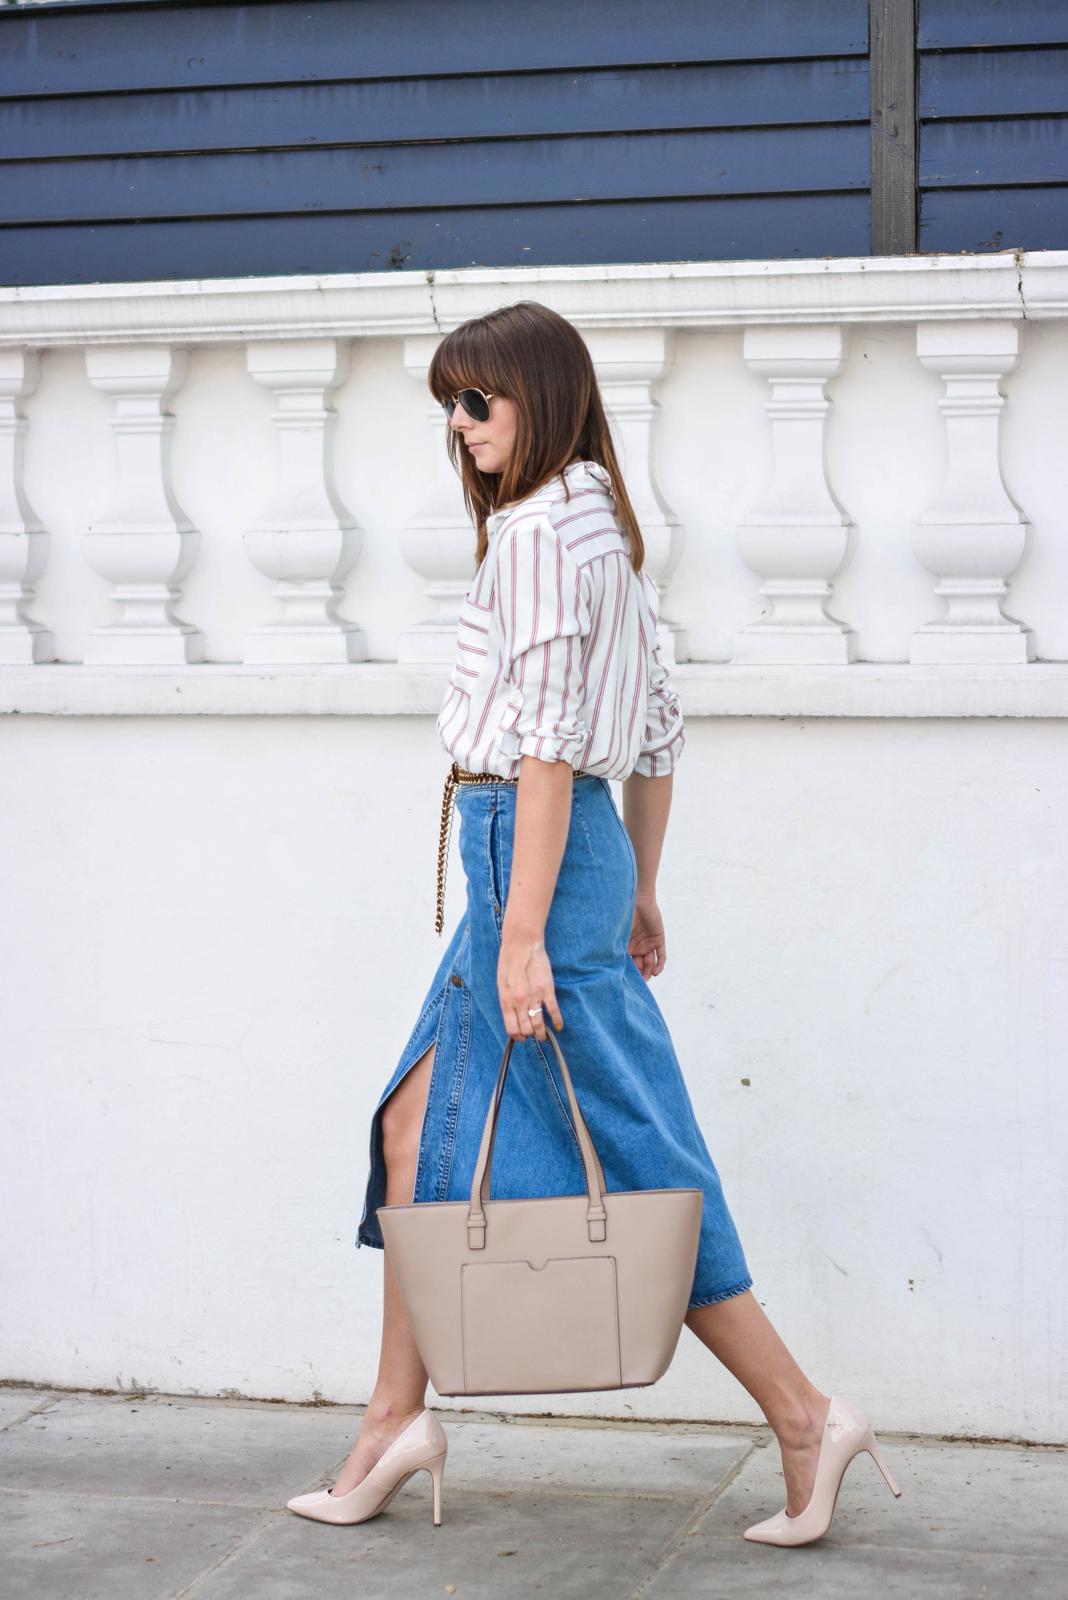 EJSTYLE - Emma Hill wears Zara denim a line button midi skirt, Zara 70s stripe shirt, Nude pointed court shoes, Mango beige tote bag, tan suede gold chain belt, OOTD, street style